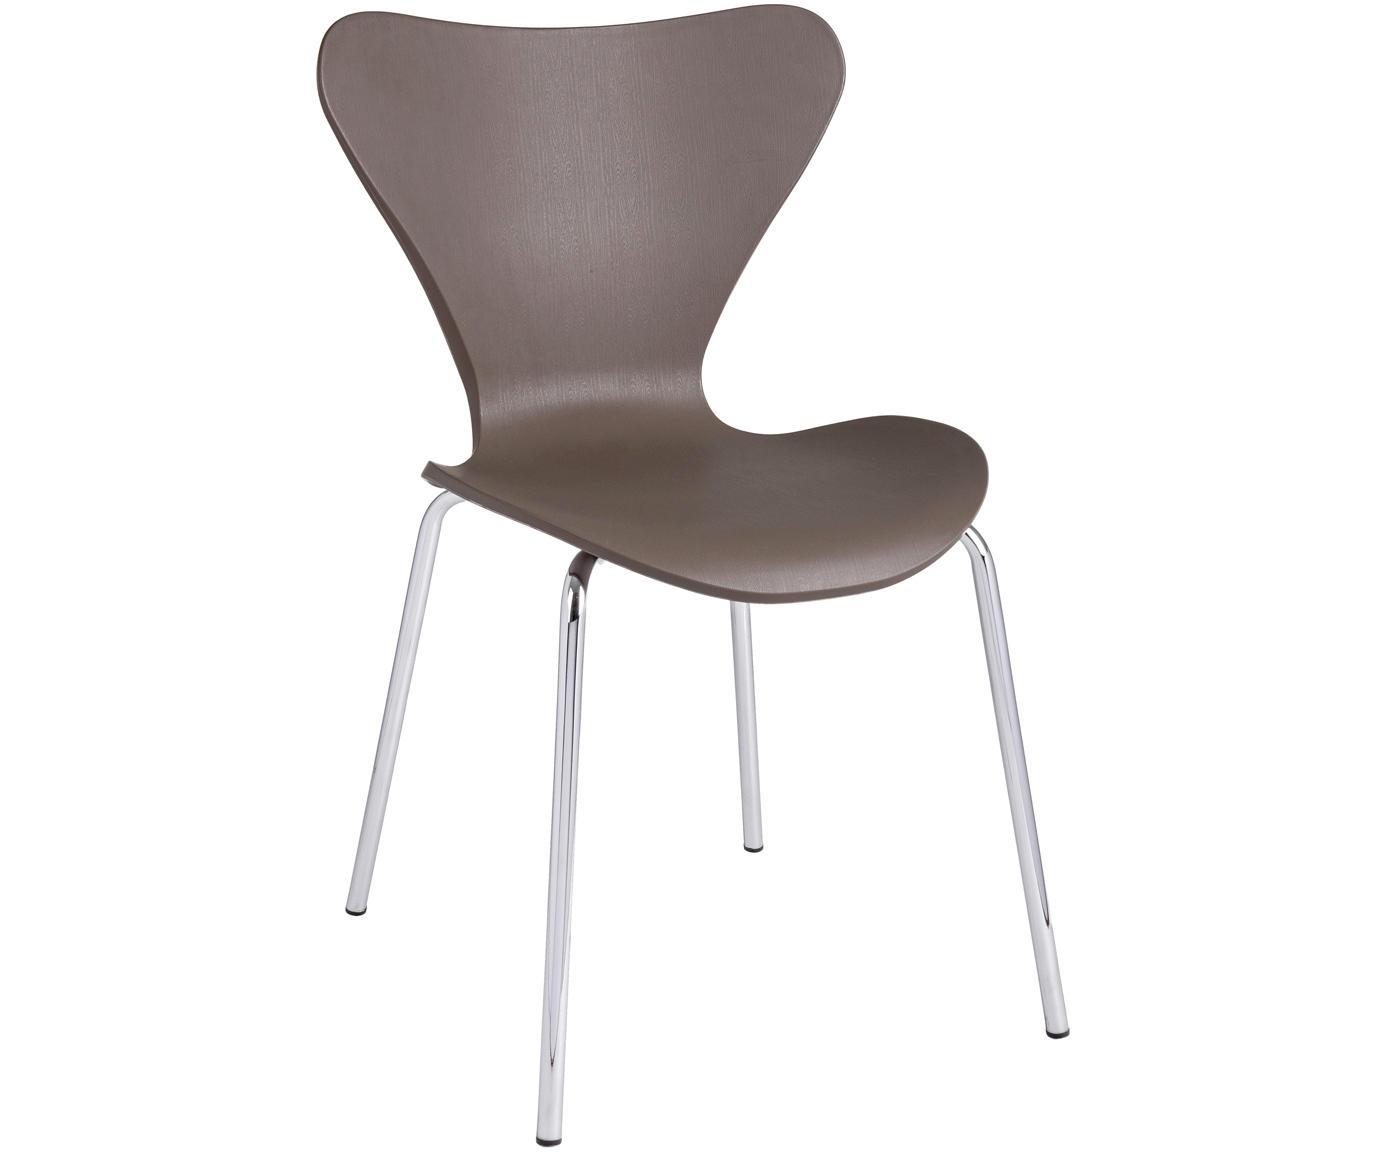 Sedia impilabile in plastica Tessa 2 pz, Seduta: materiale sintetico (poli, Gambe: metallo cromato, Colori cammello, cromo, Larg. 50 x Prof. 50 cm